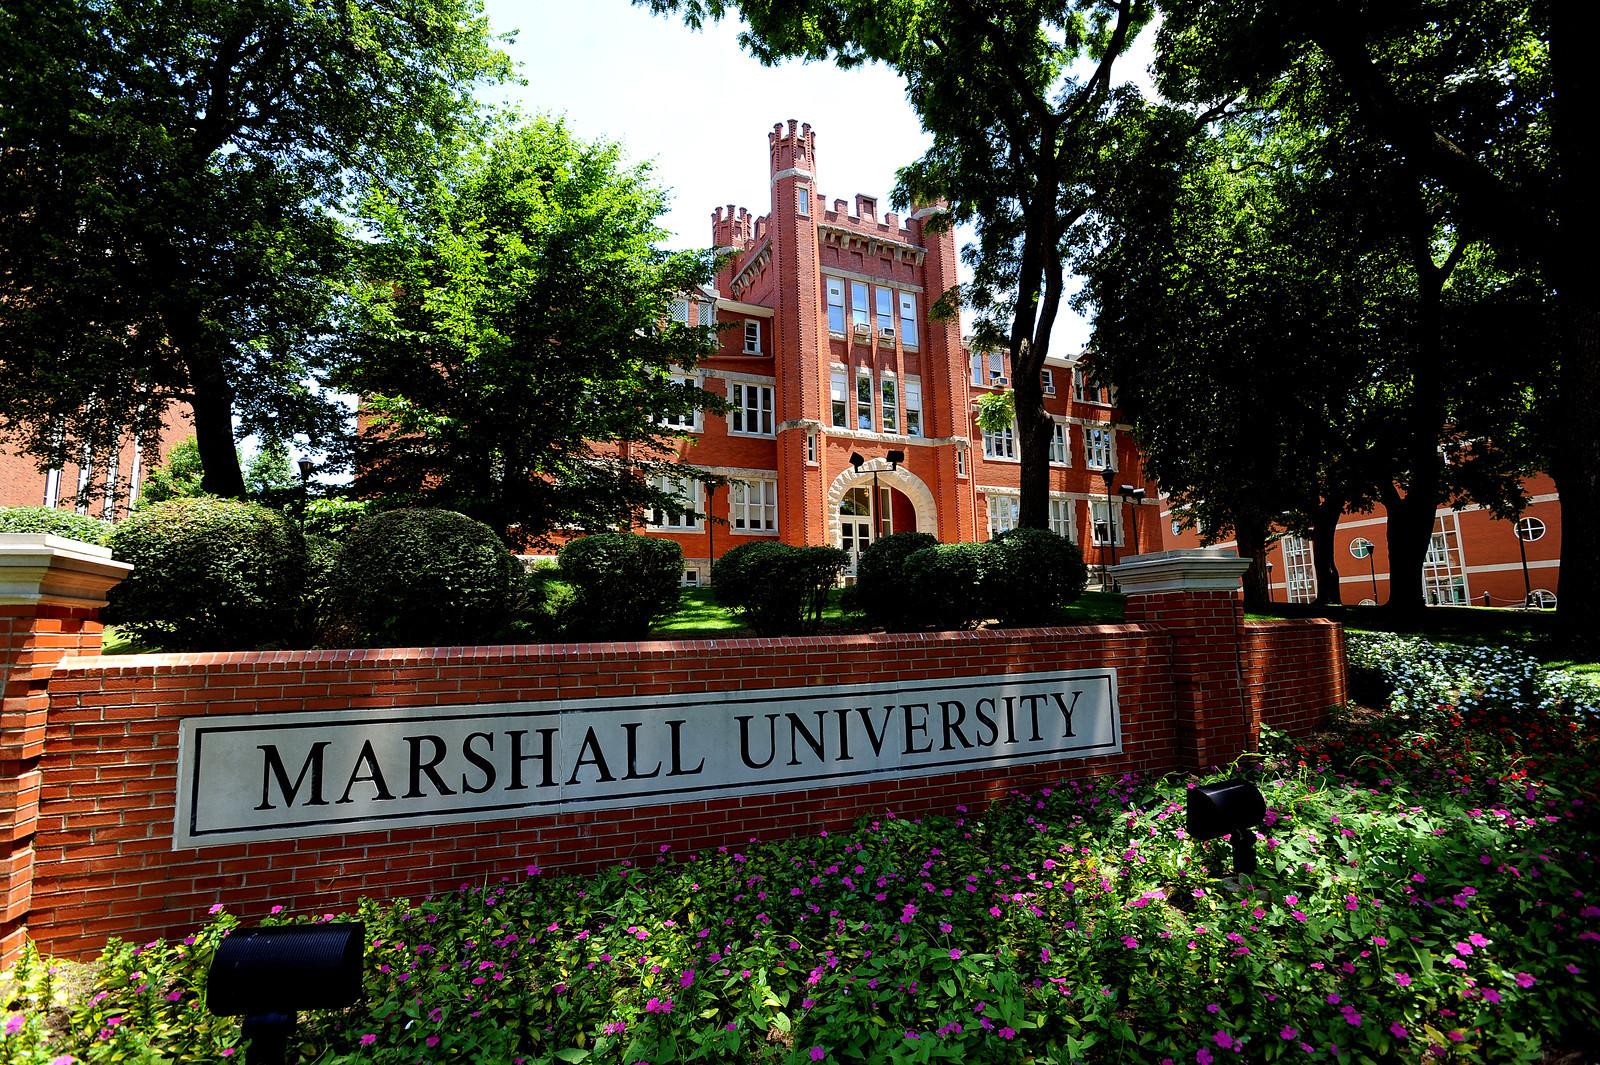 Marshall University 84.35%